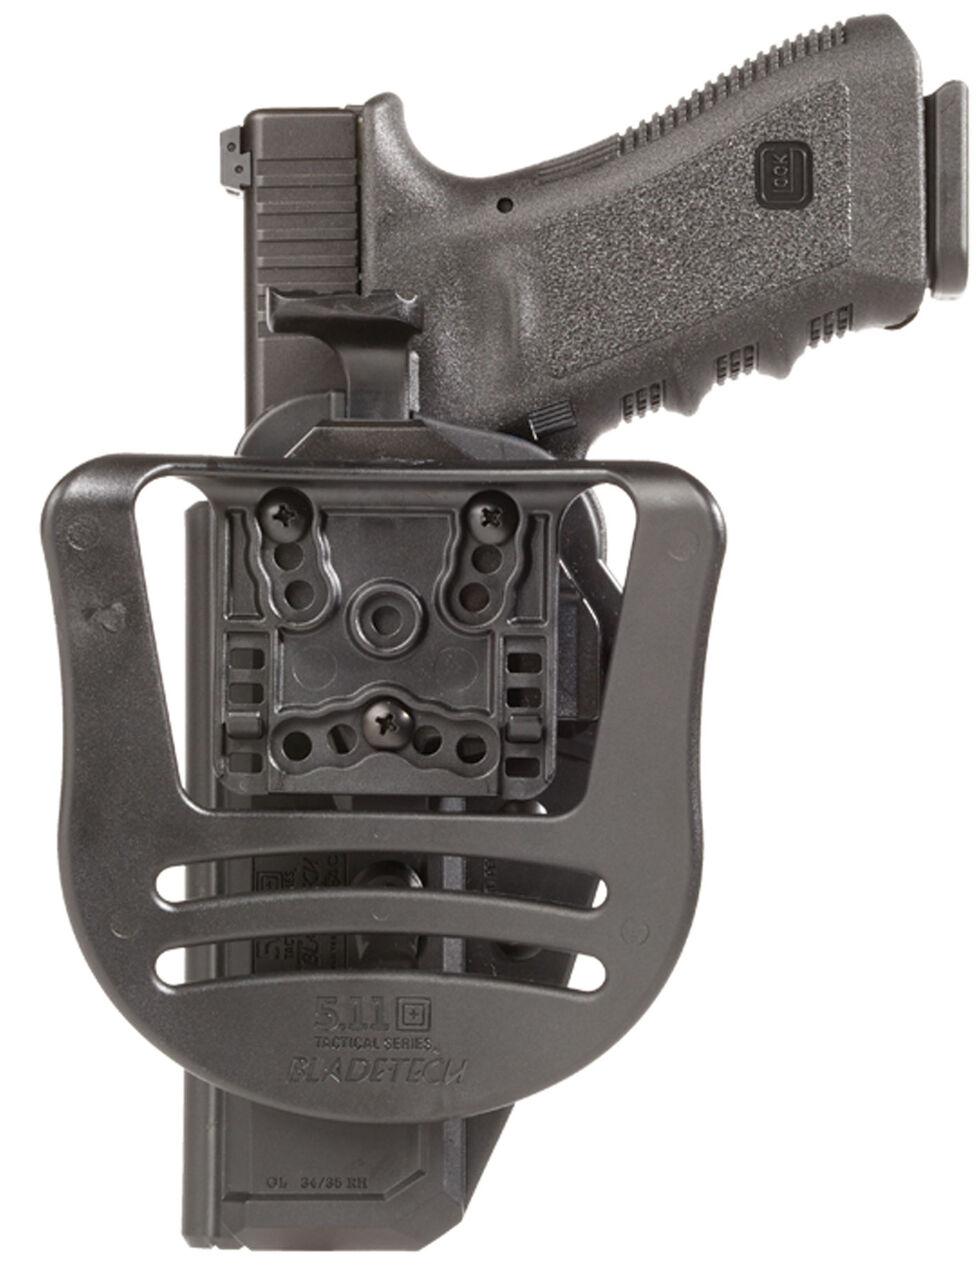 5.11 Thumbdrive Holster - Glock 19/23 (Left Hand), Black, hi-res